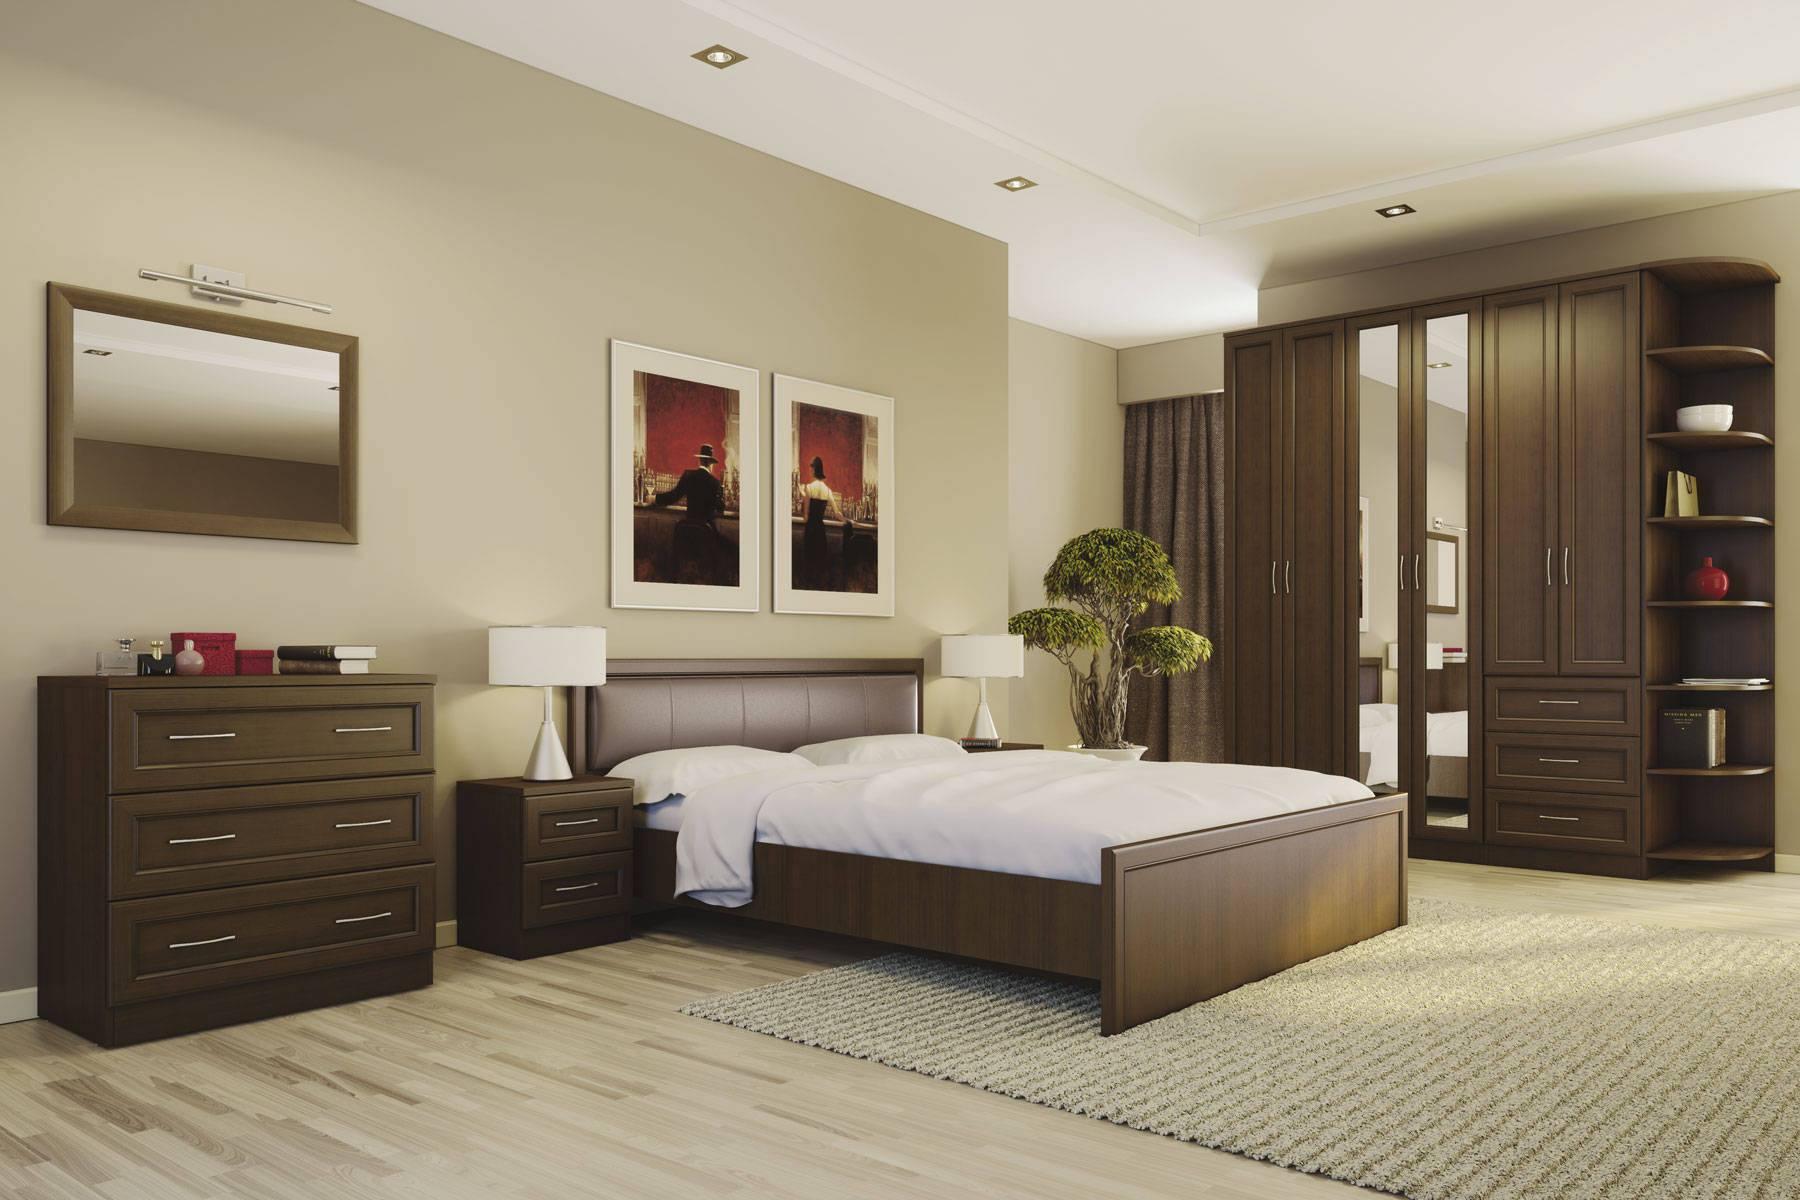 нео мебель екатеринбург каталог цены диваны